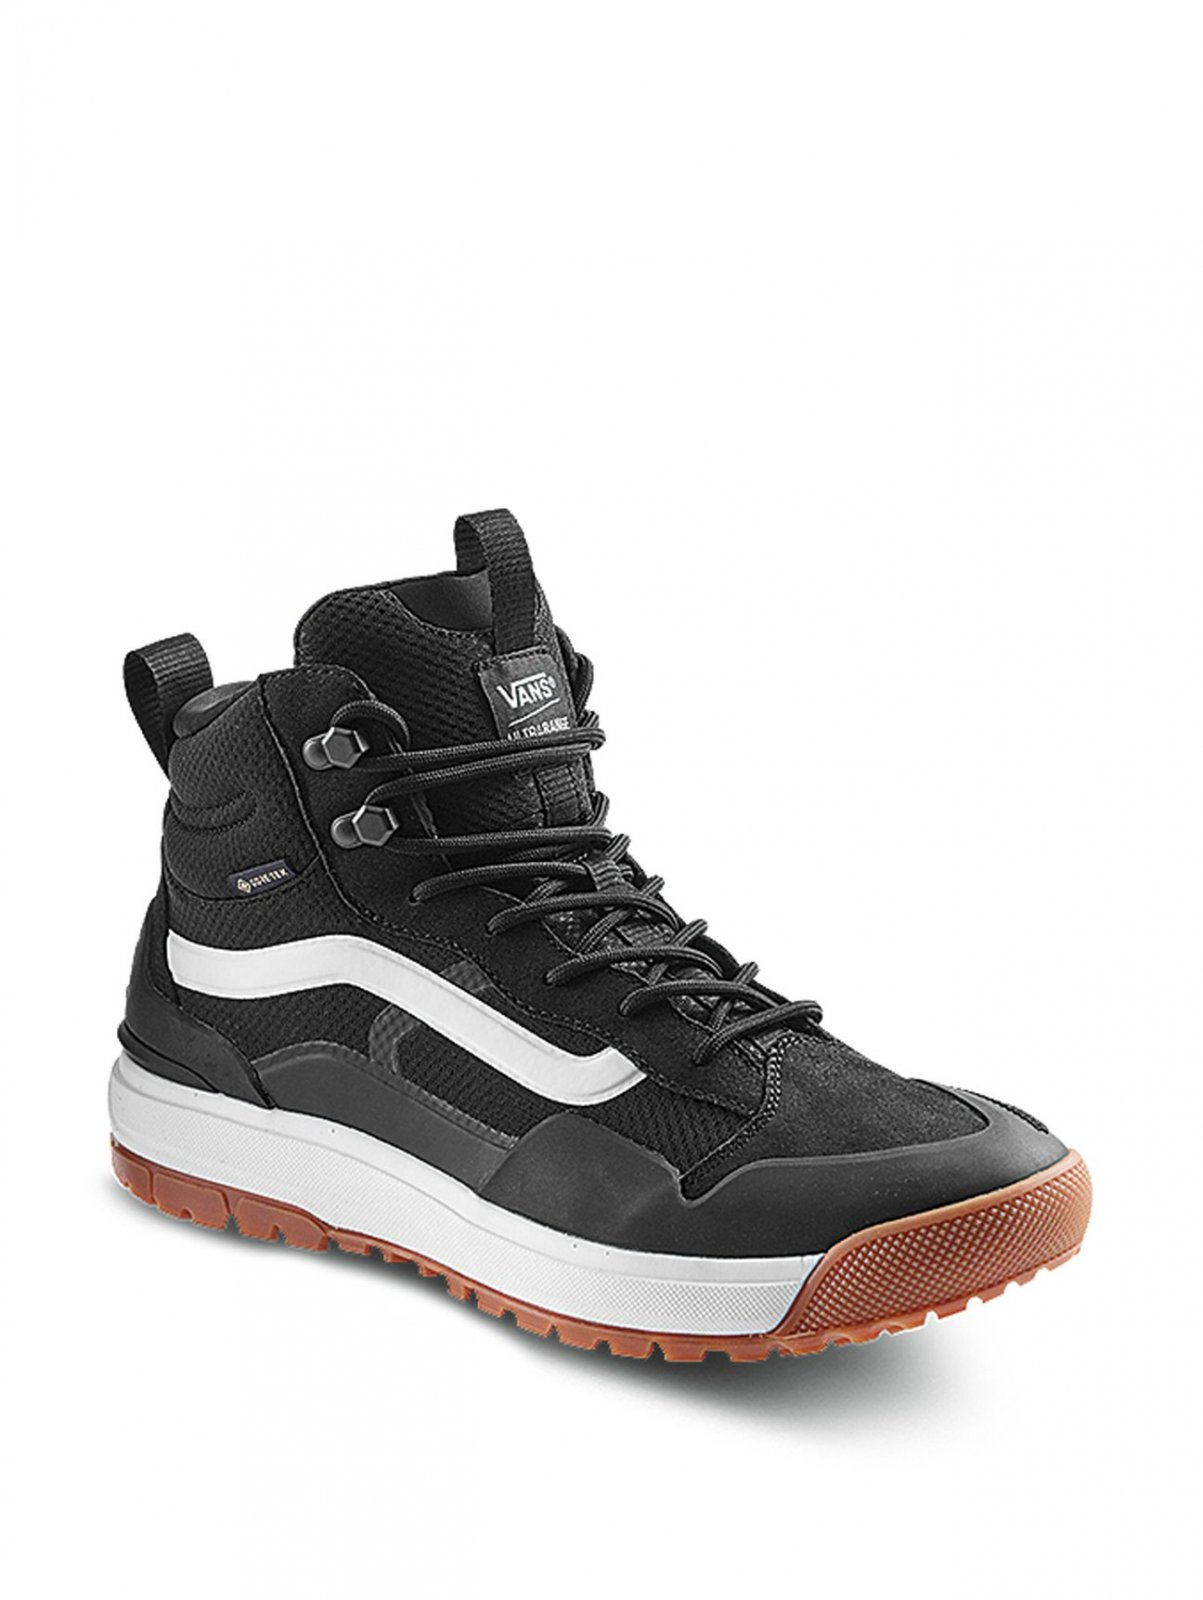 Vans Ultrarange EXO Hi MTE Shoes (Multiple Color Options)